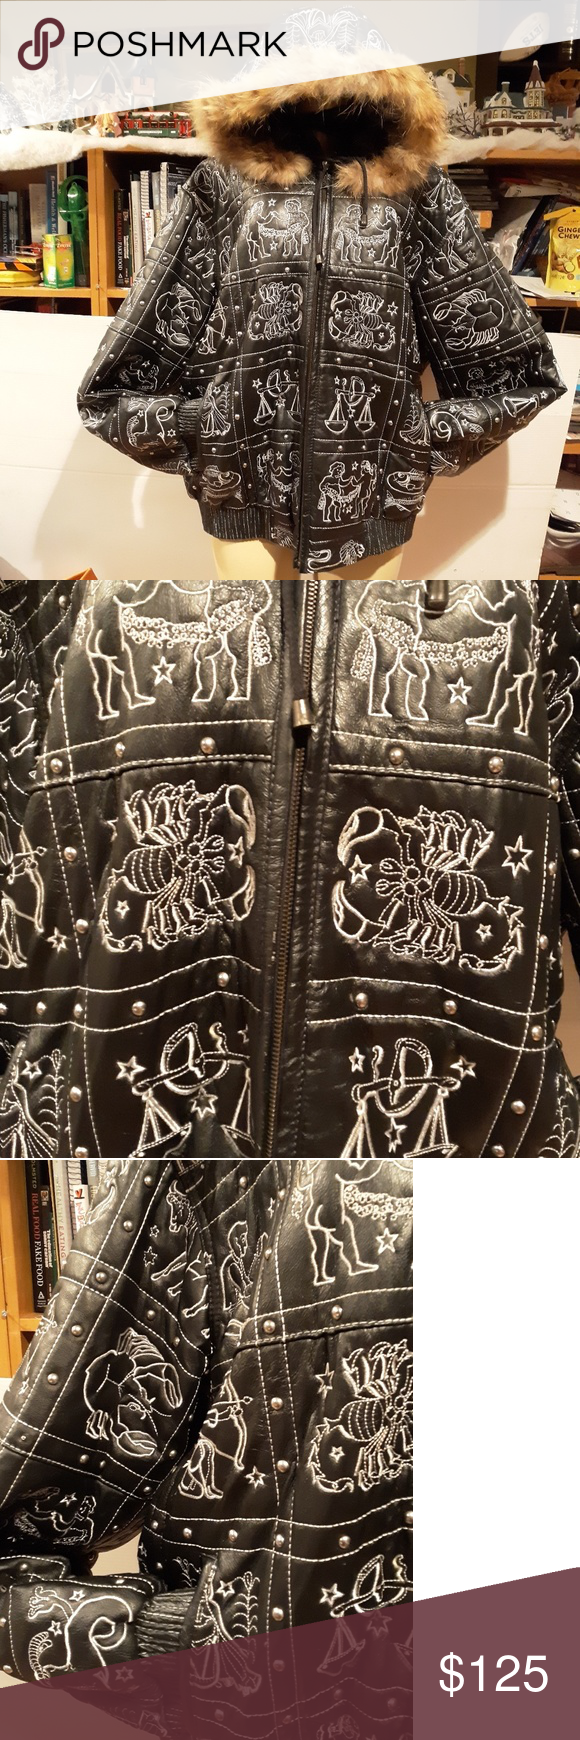 Vilanto Rare Vtg 80 S Leather Jacket Wow Like New Awesome Vtg 80 S Leather Jacket Astrology Signs This Jacket Says S Leather Jacket Jackets Fashion [ 1740 x 580 Pixel ]